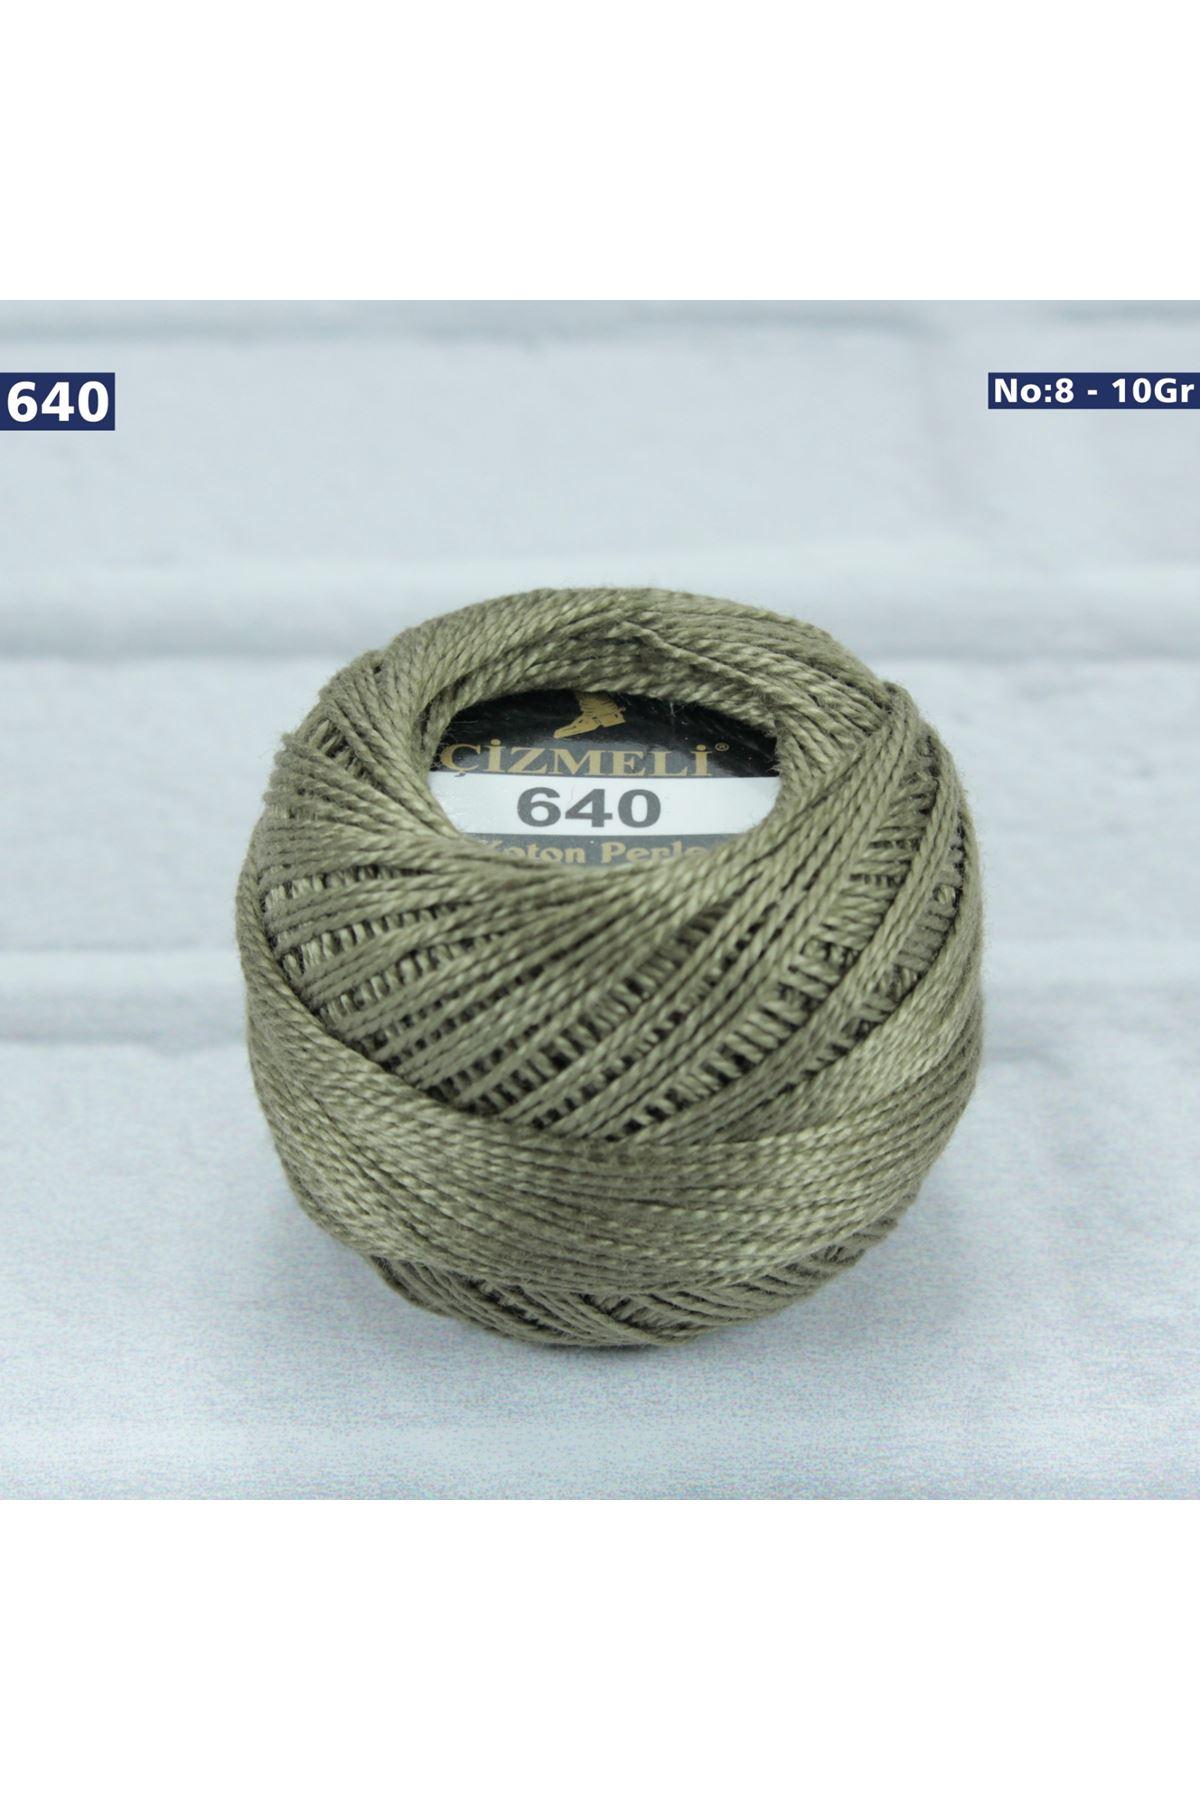 Çizmeli Cotton Perle Nakış İpliği No: 640